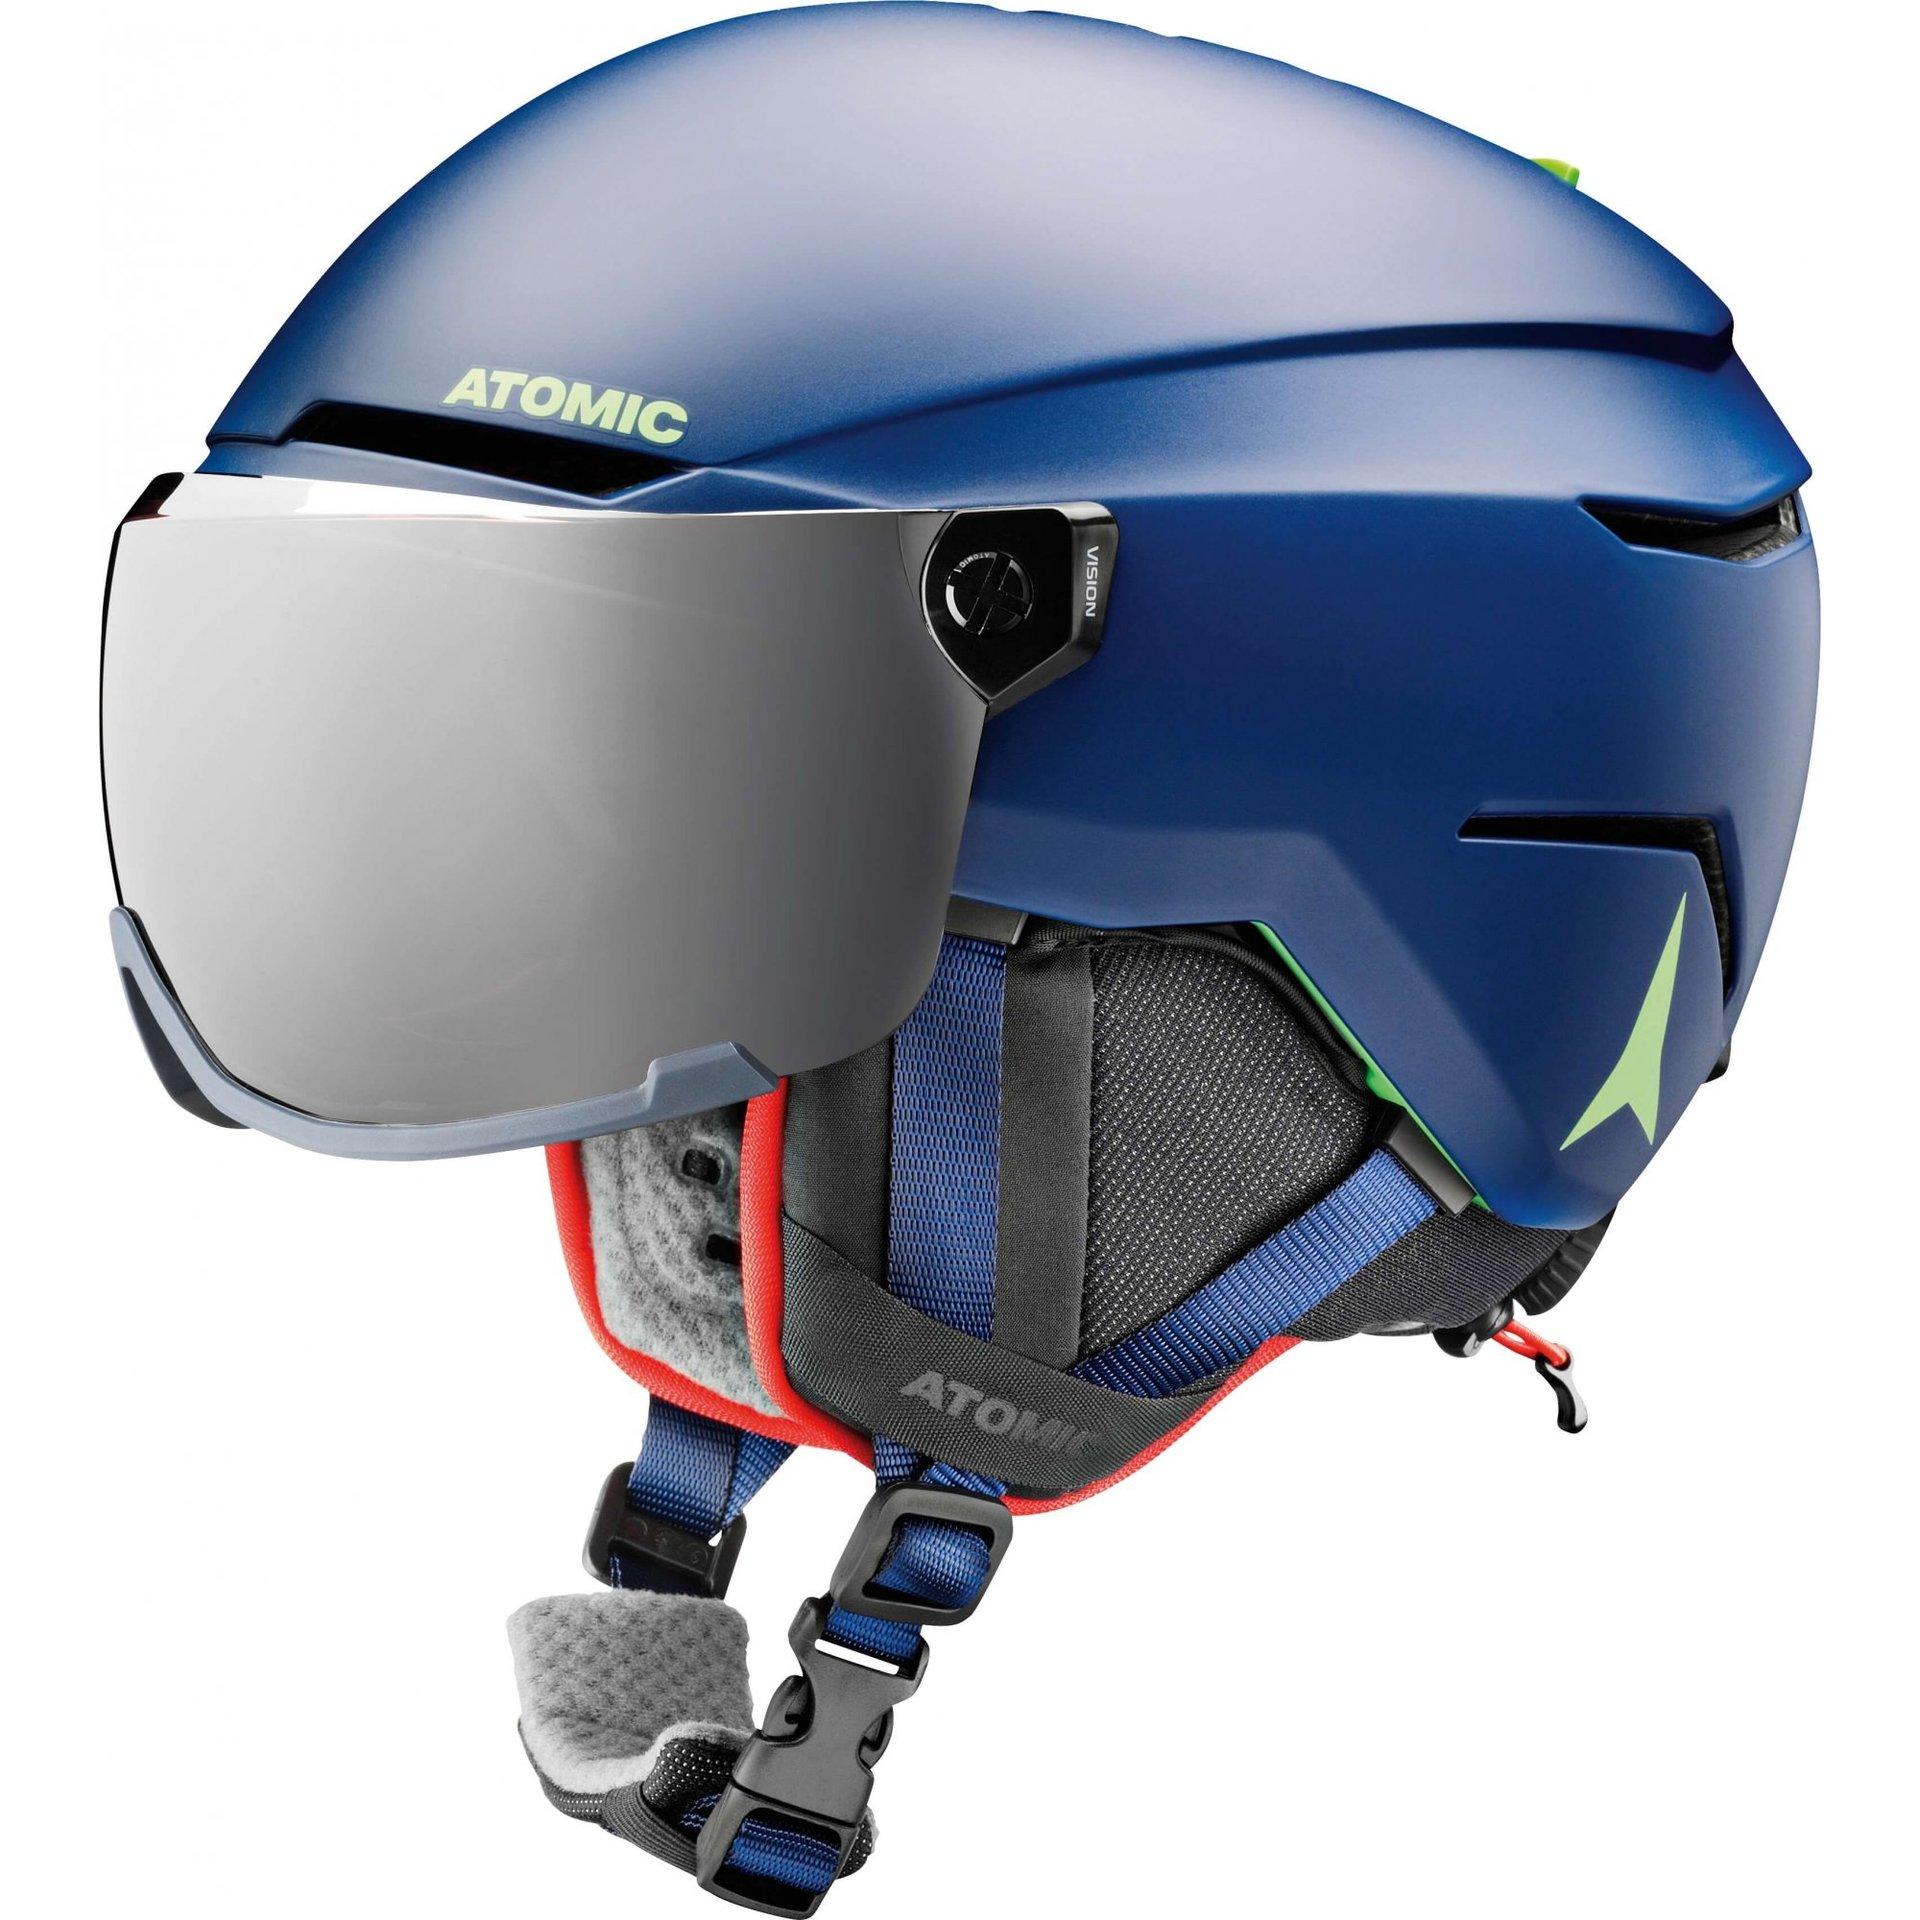 KASK ATOMIC SAVOR VISOR JR BLUE AN5005724 1